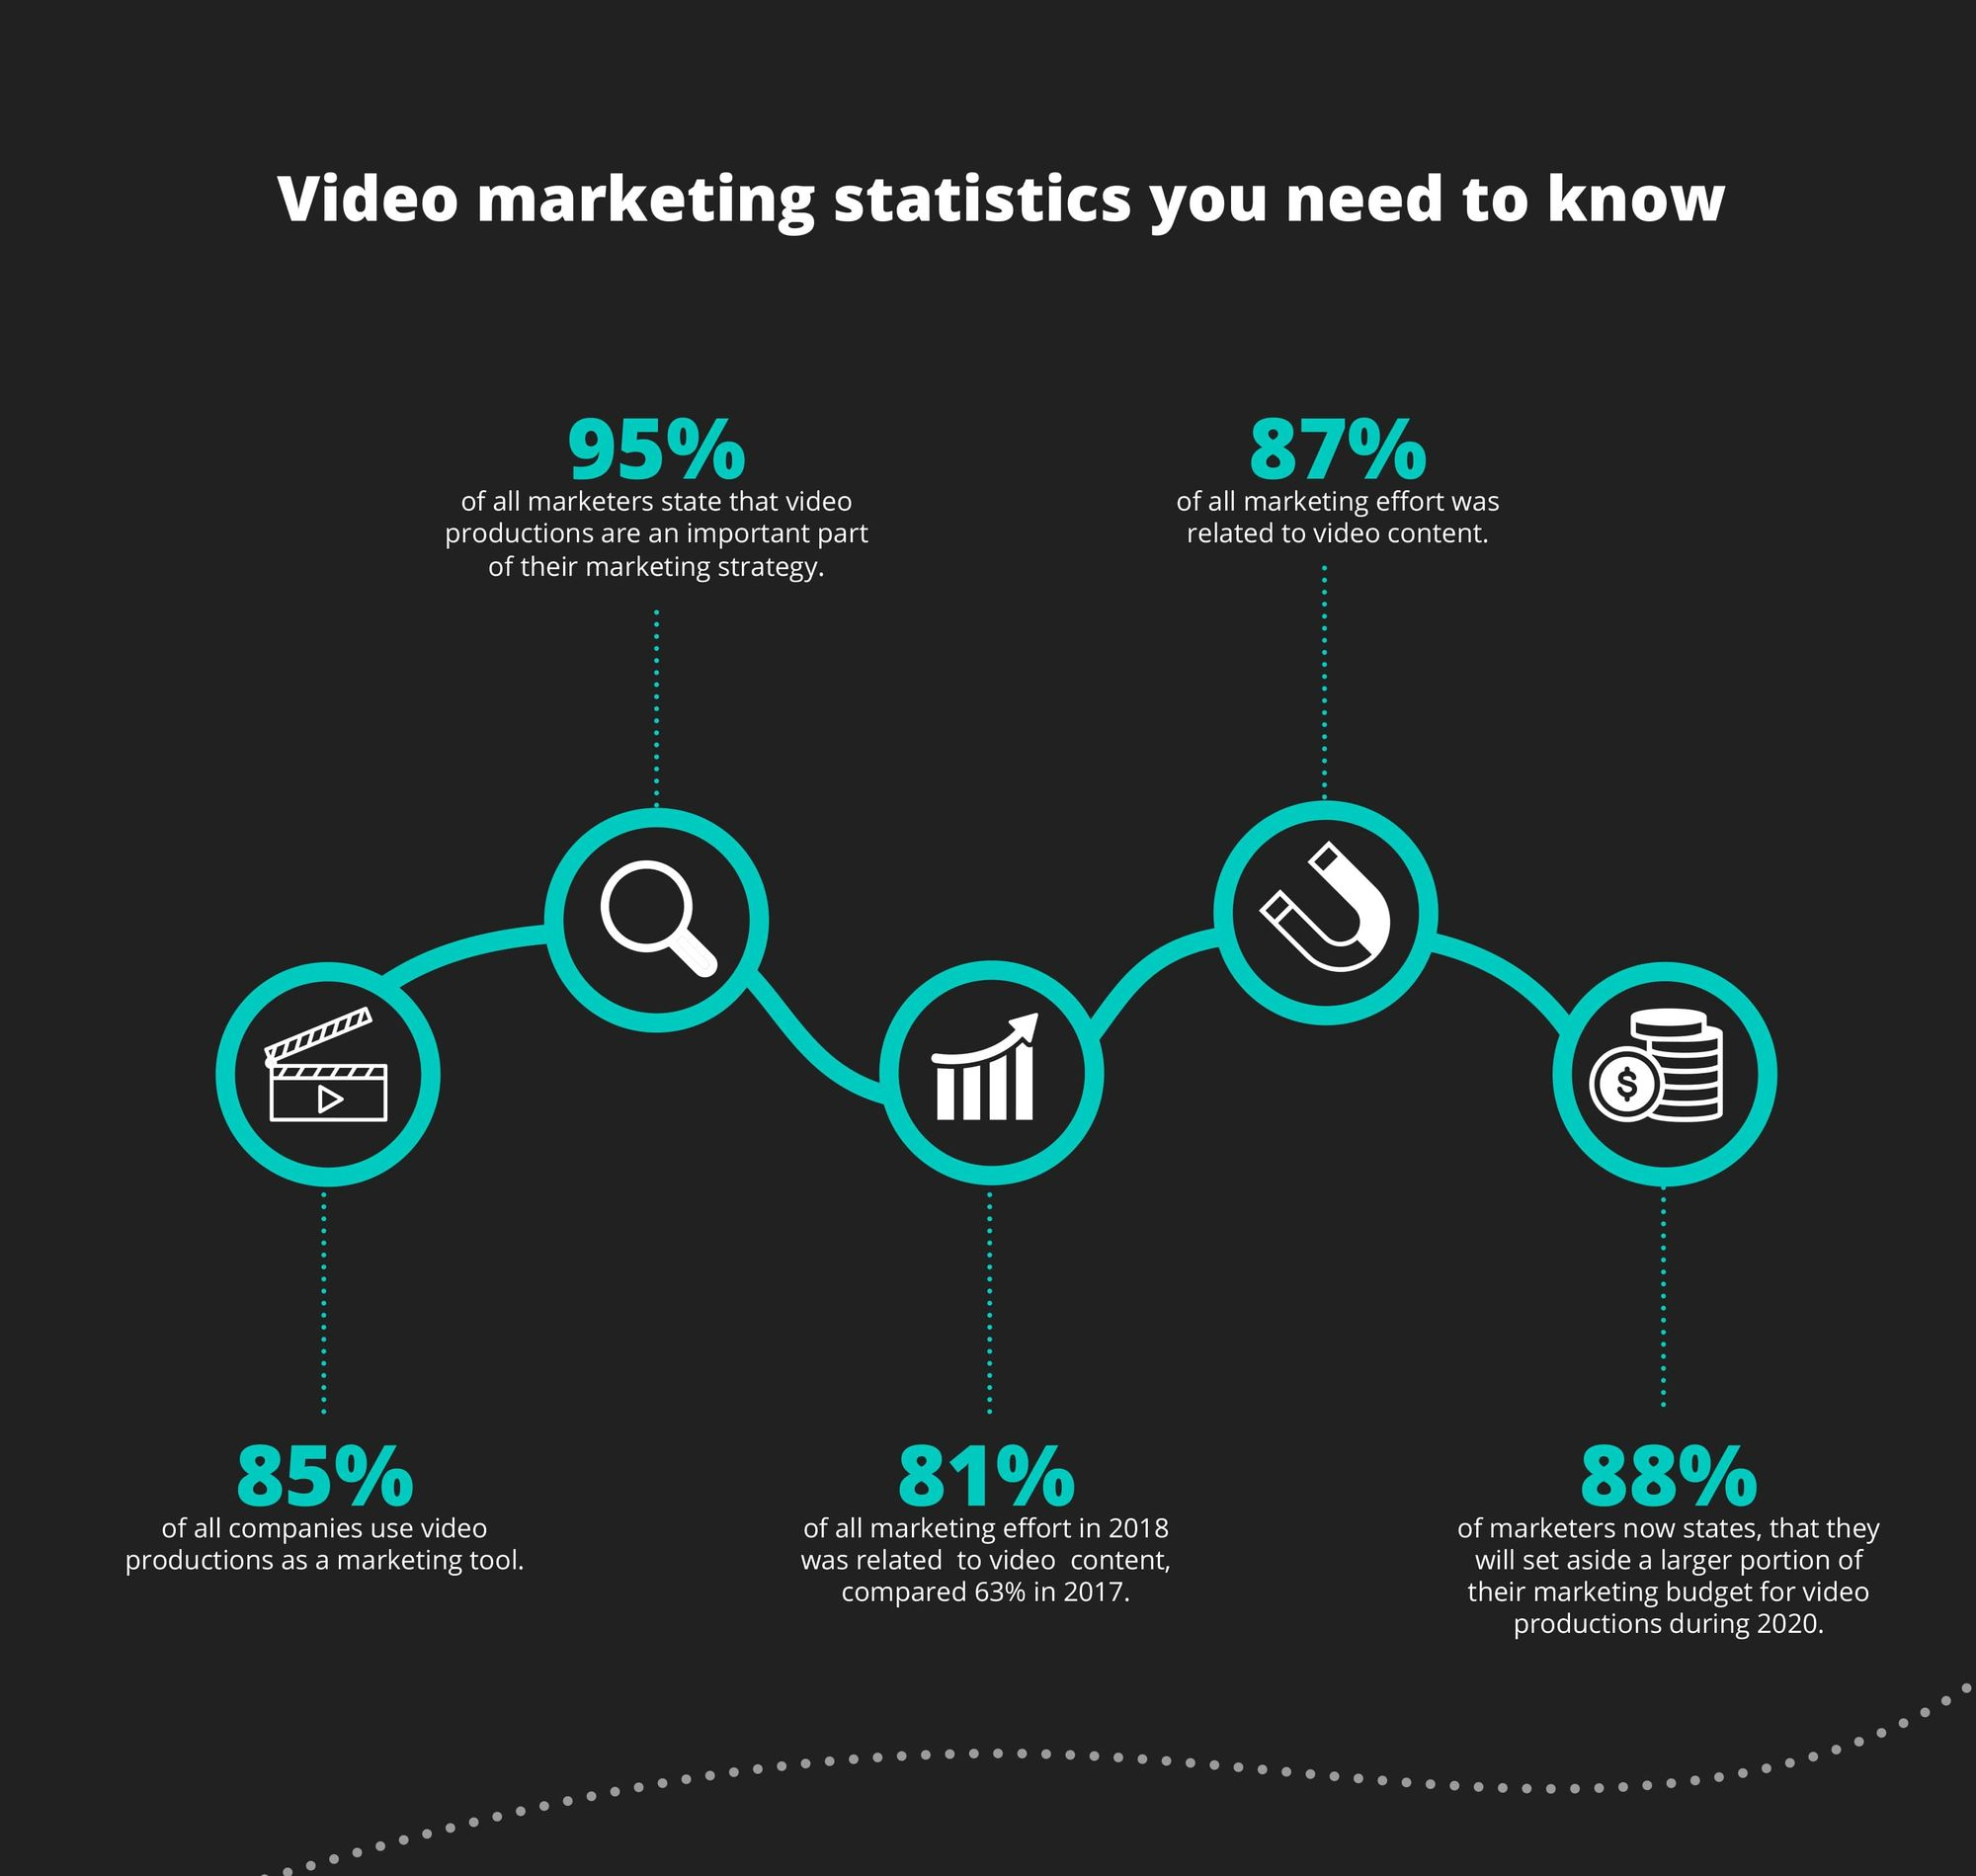 Important video marketing statistics